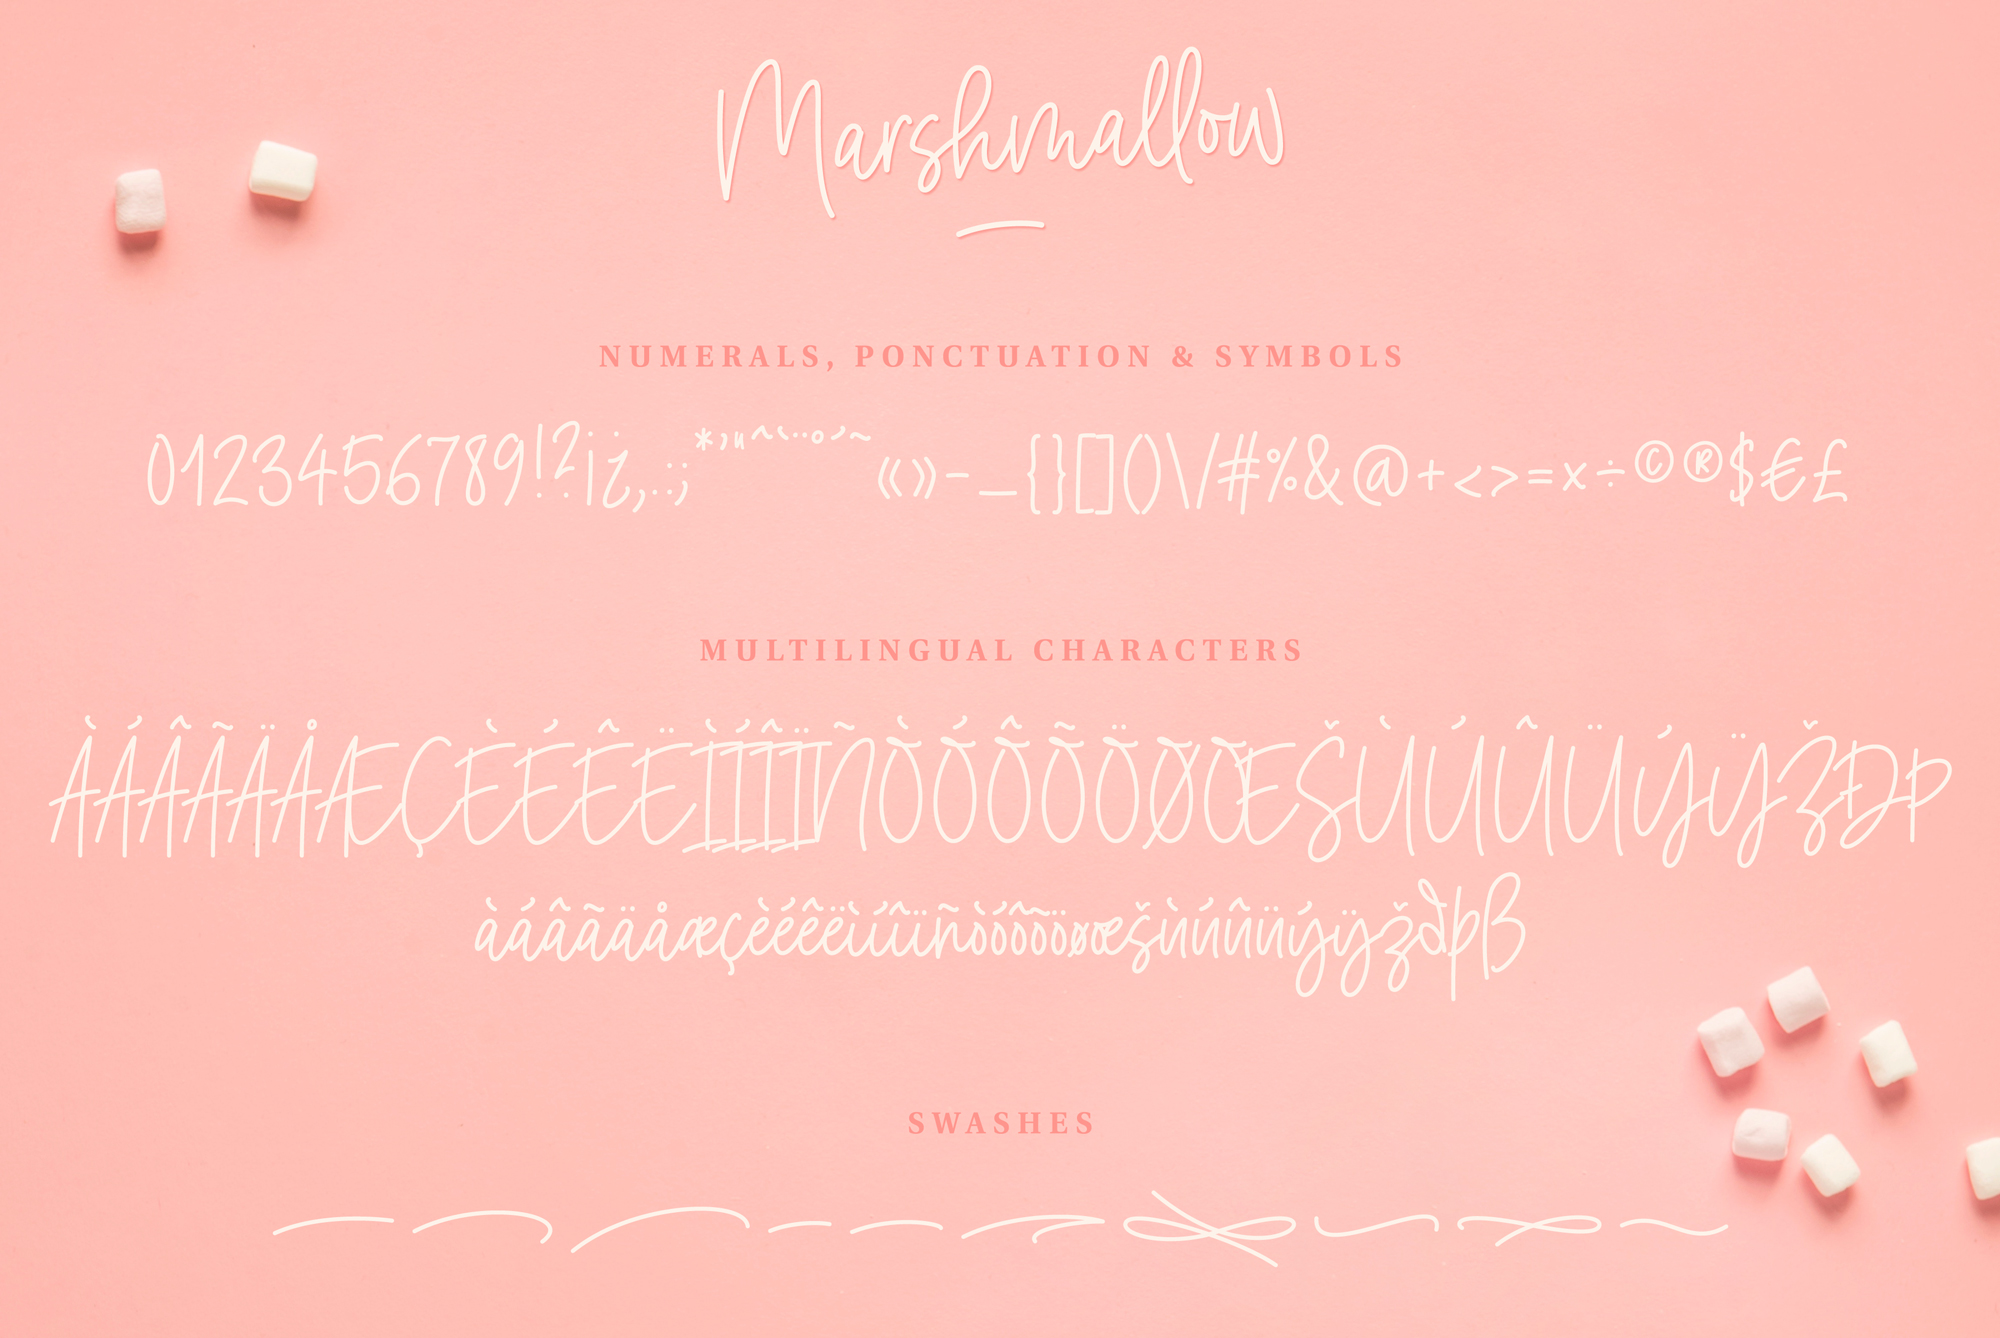 Marshmallow Handwritten Font example image 8